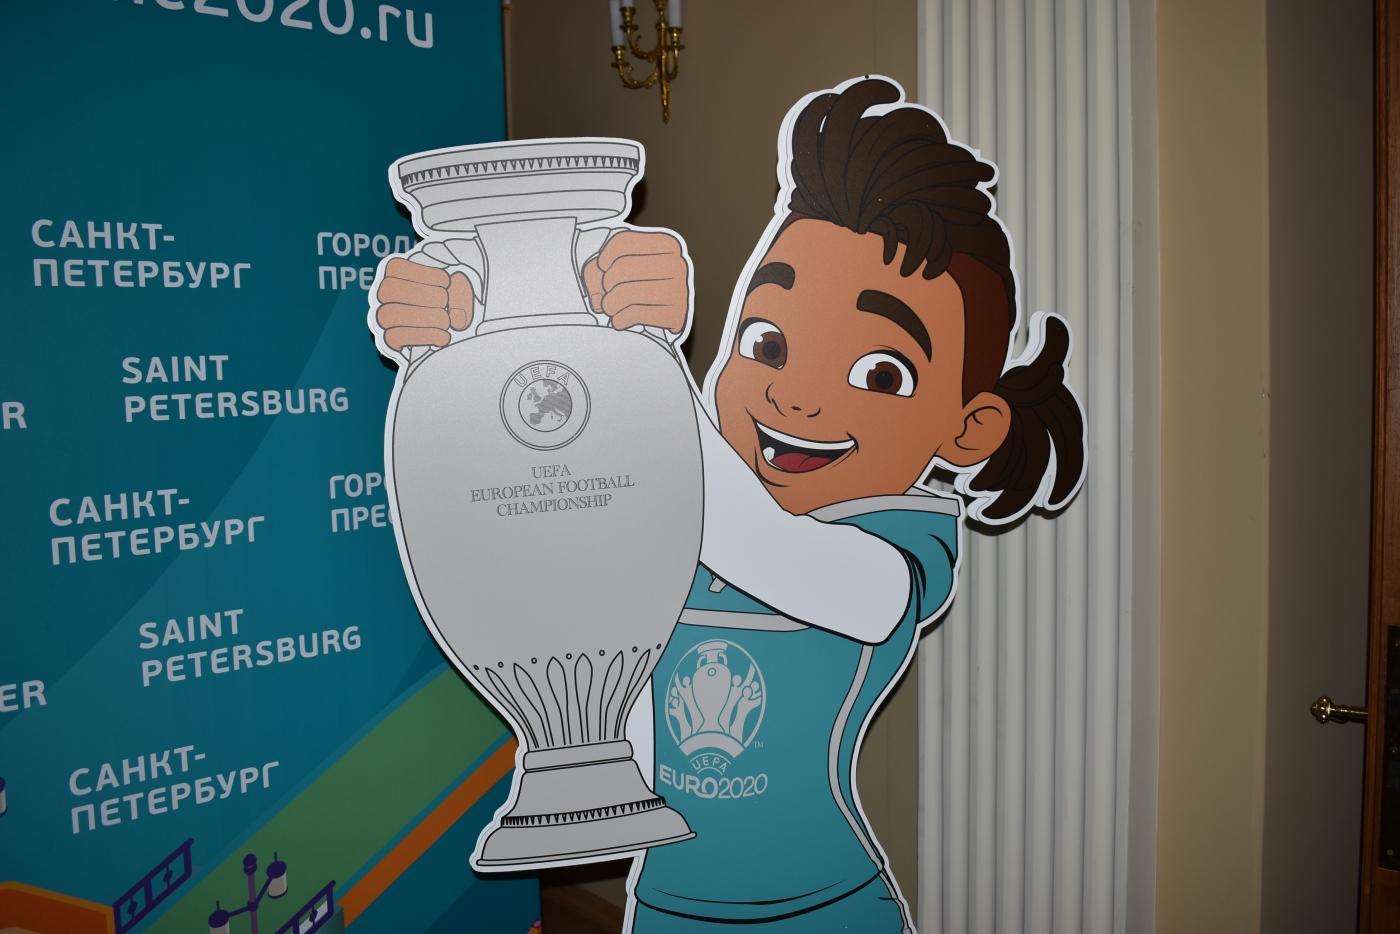 Евро 2020 Новости футбола